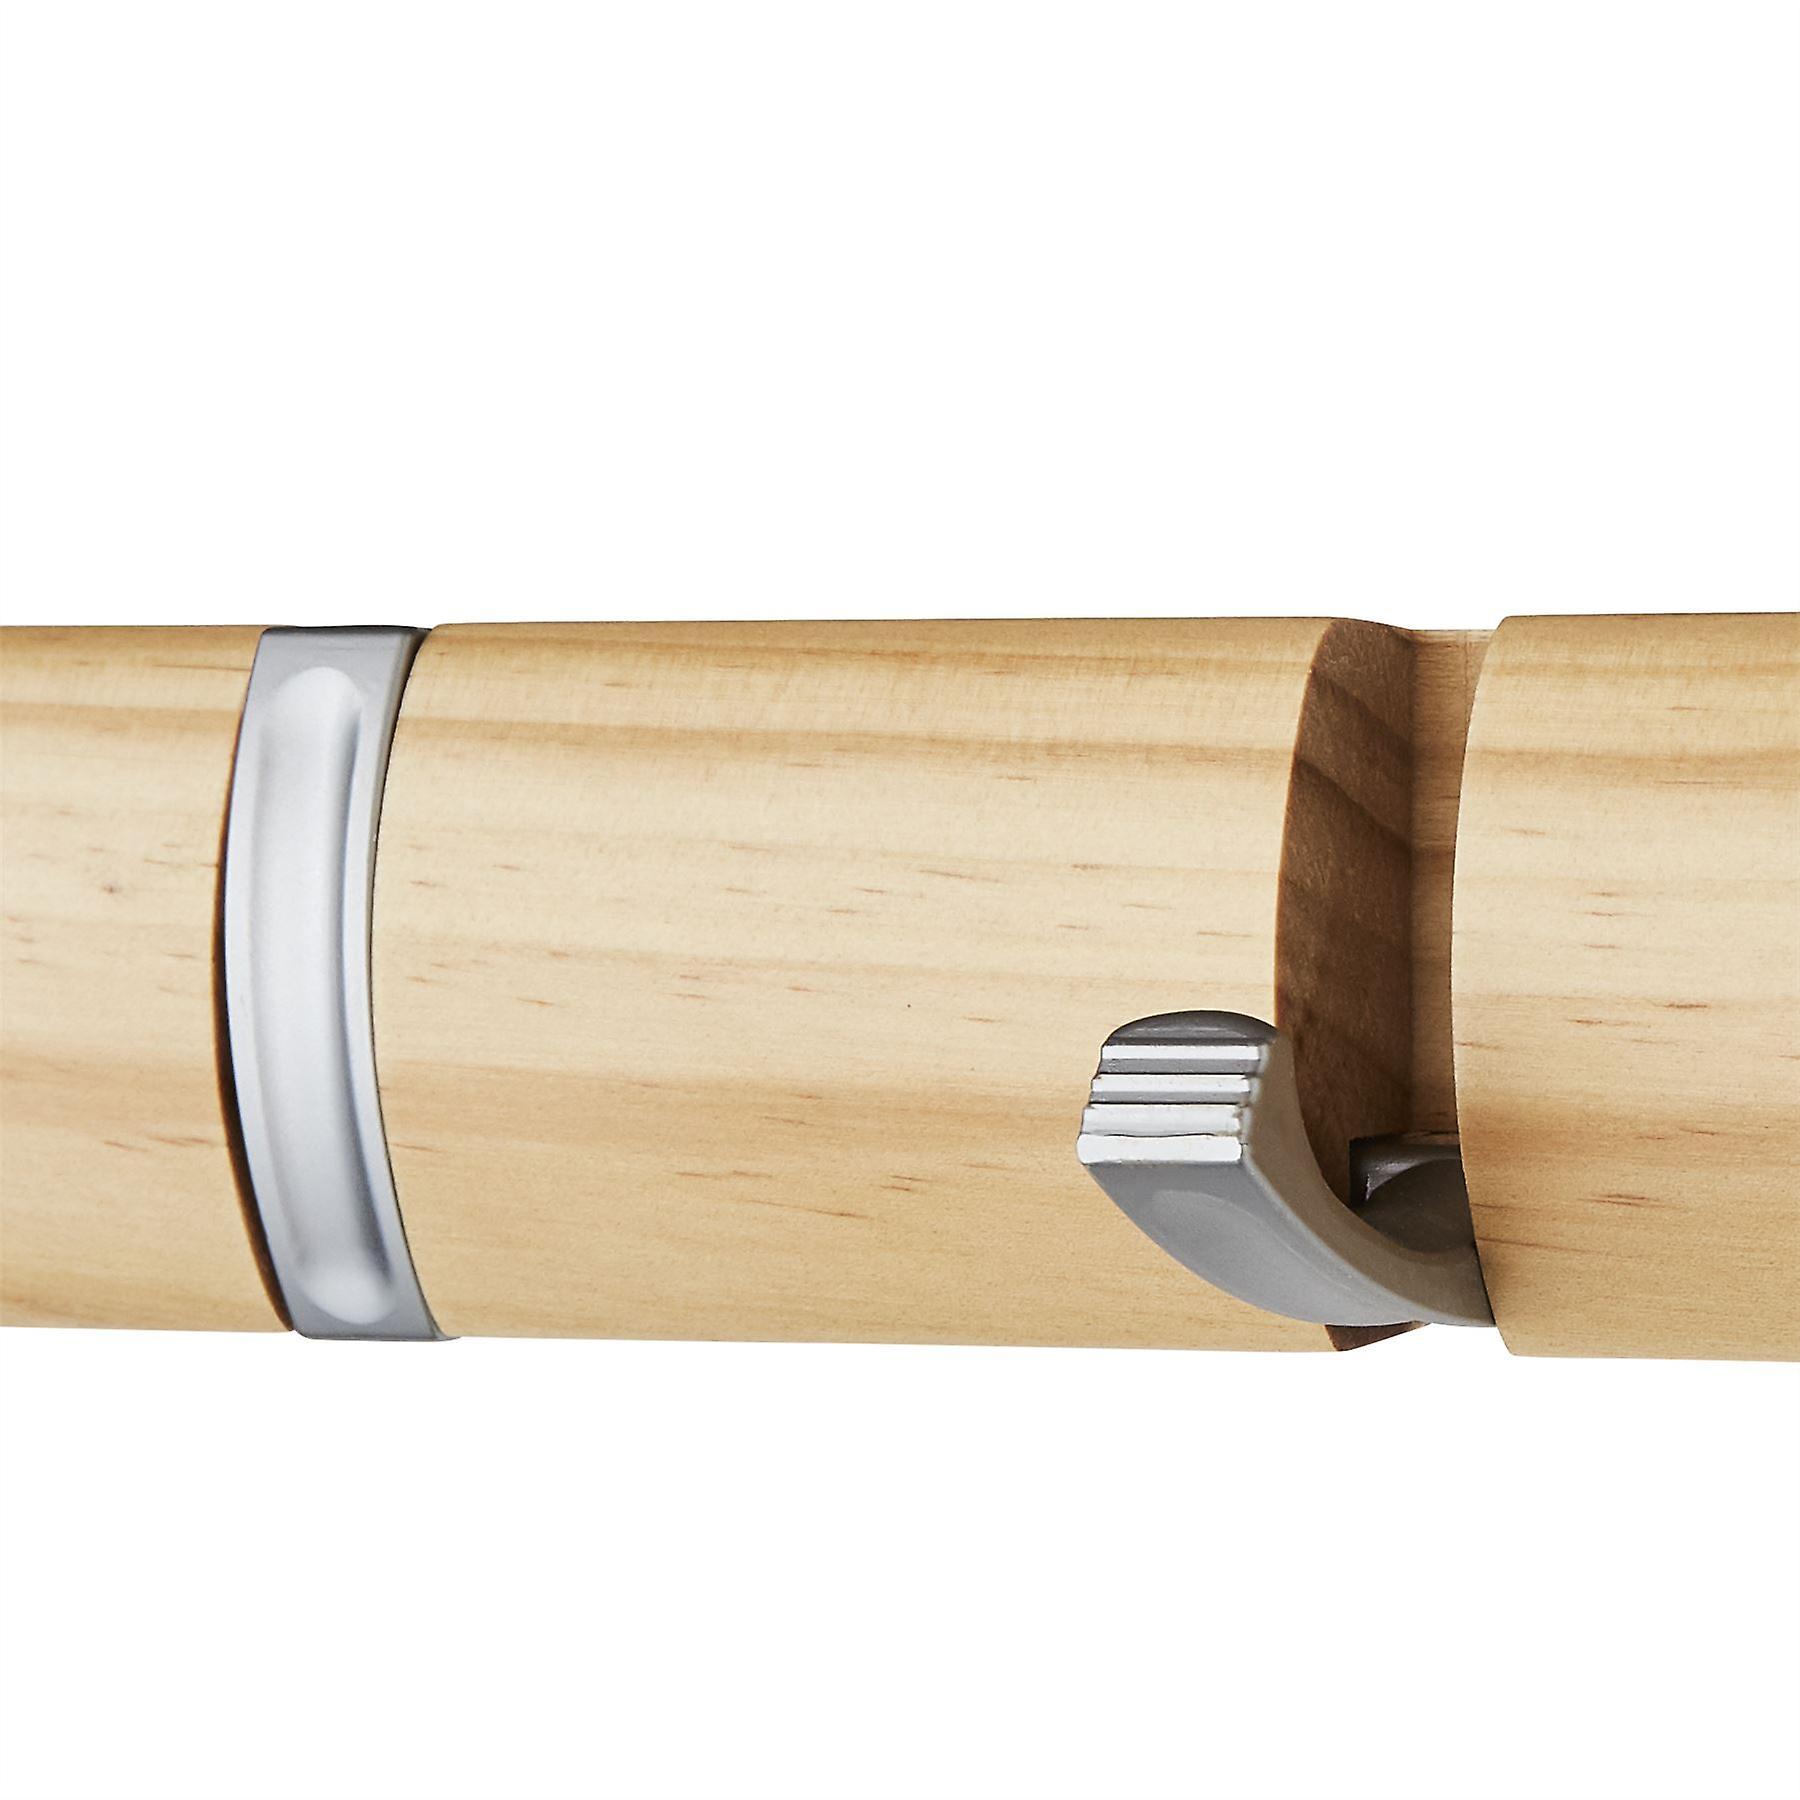 5 Door Hooks In Satin Chrome On Natural Pine Mountable Board